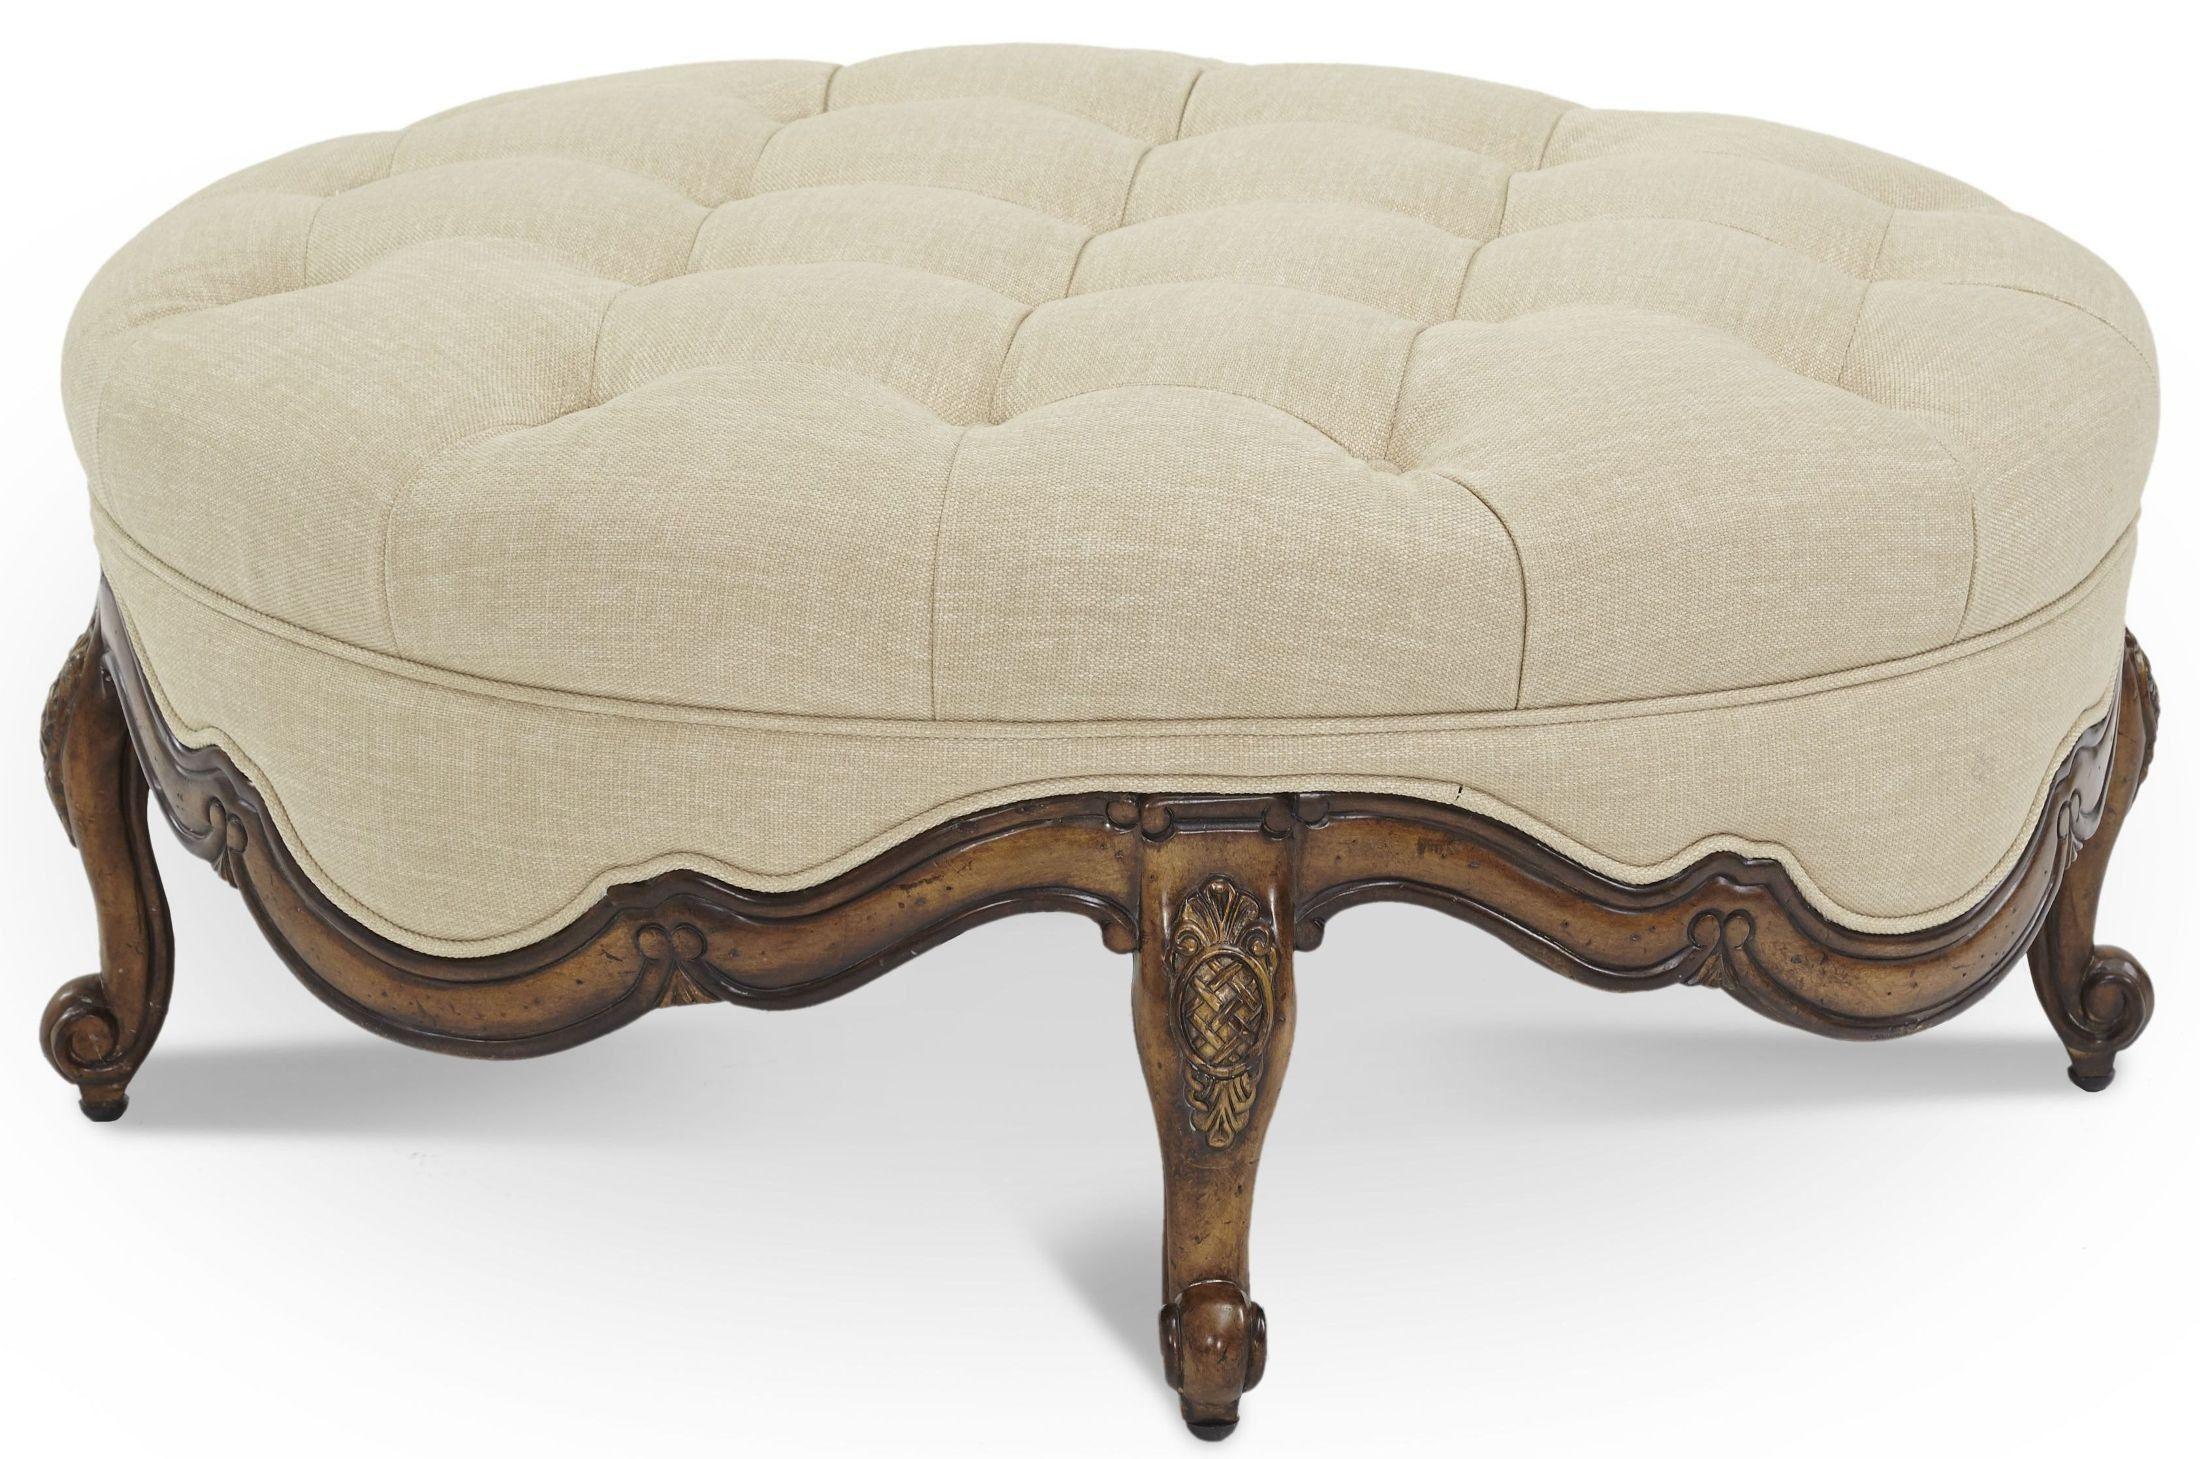 Remarkable Lavelle Melange Wood Trim Round Cocktail Ottoman Diy Short Links Chair Design For Home Short Linksinfo